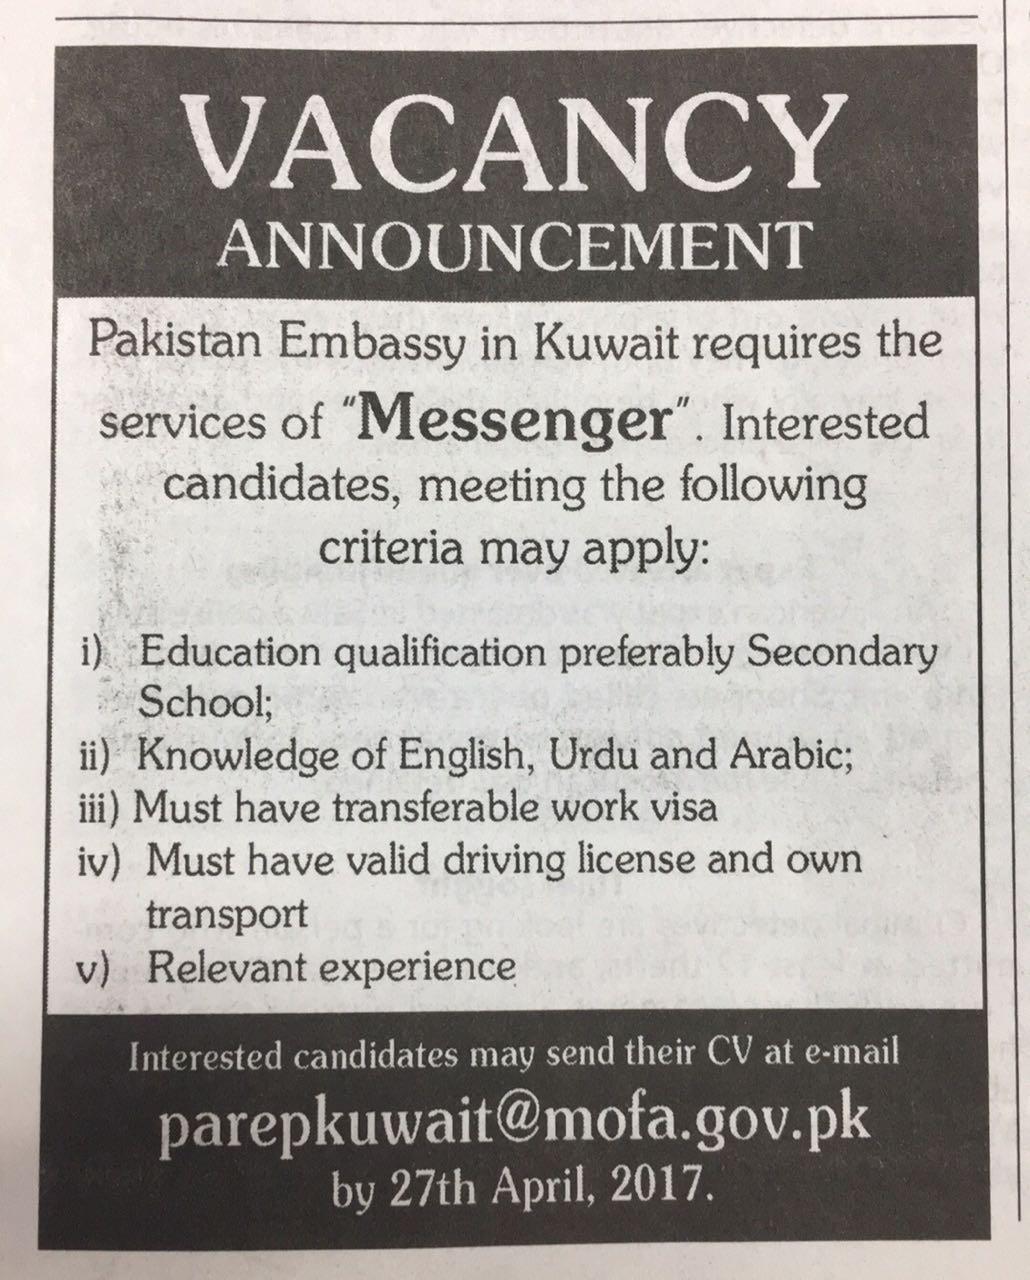 Embassy - Pakistanis in Kuwait